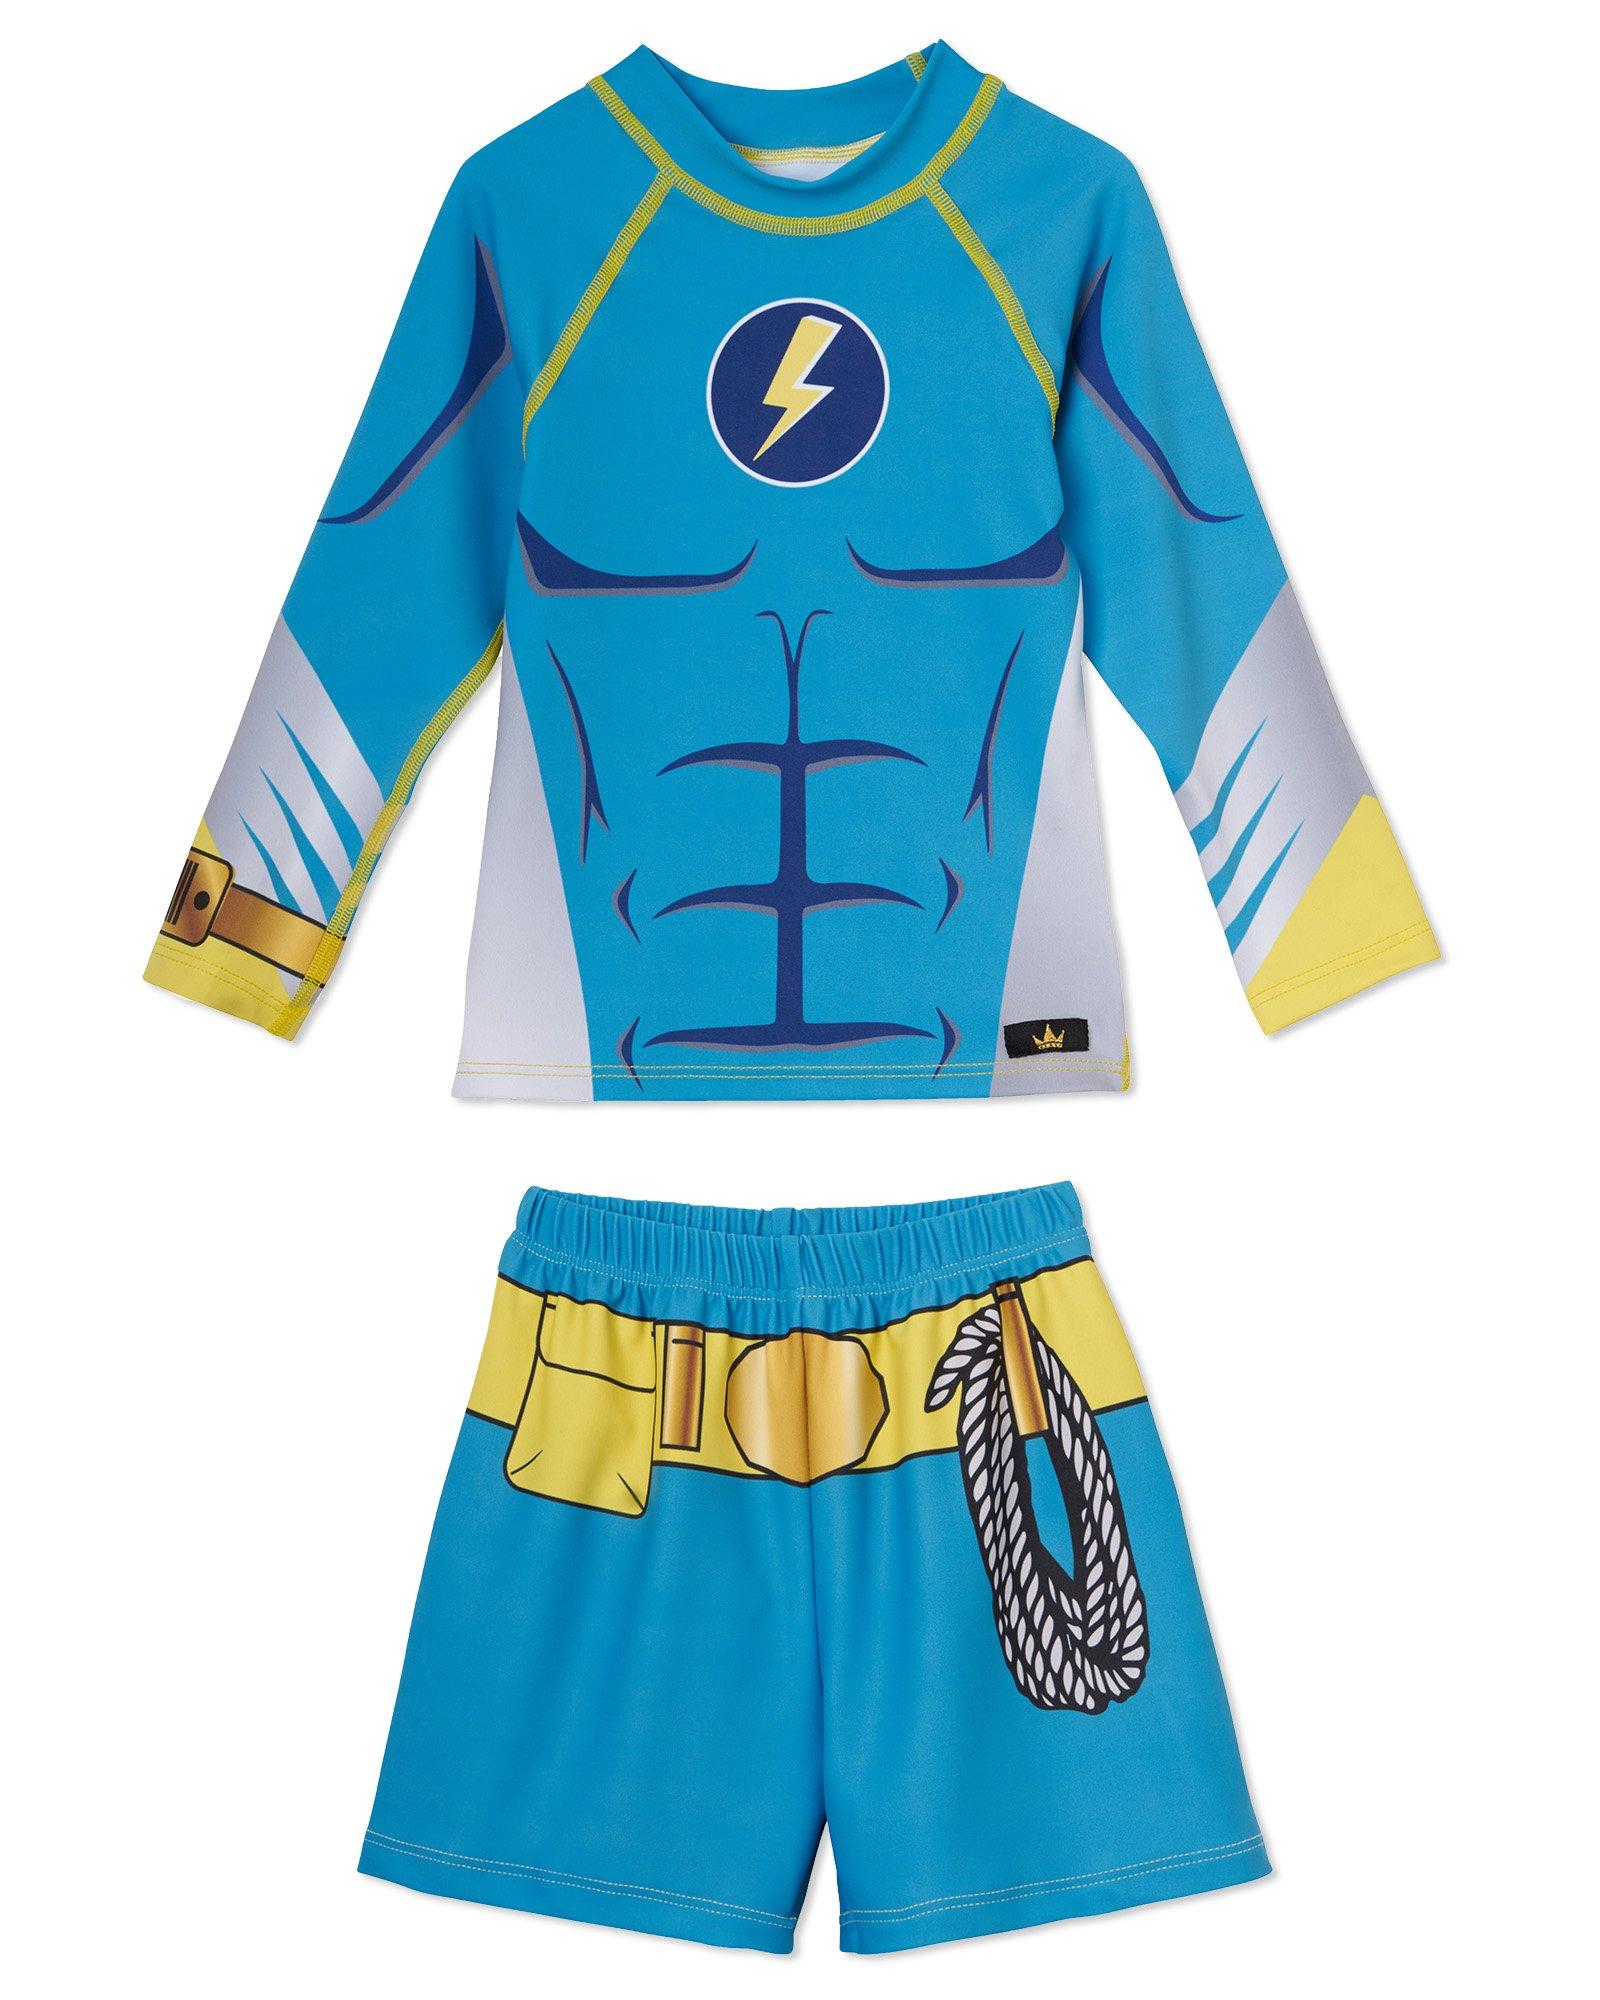 Little Boys Superhero Swim Trunks and Swimsuit Set – UPF 50 – Won't Fade – USA Made